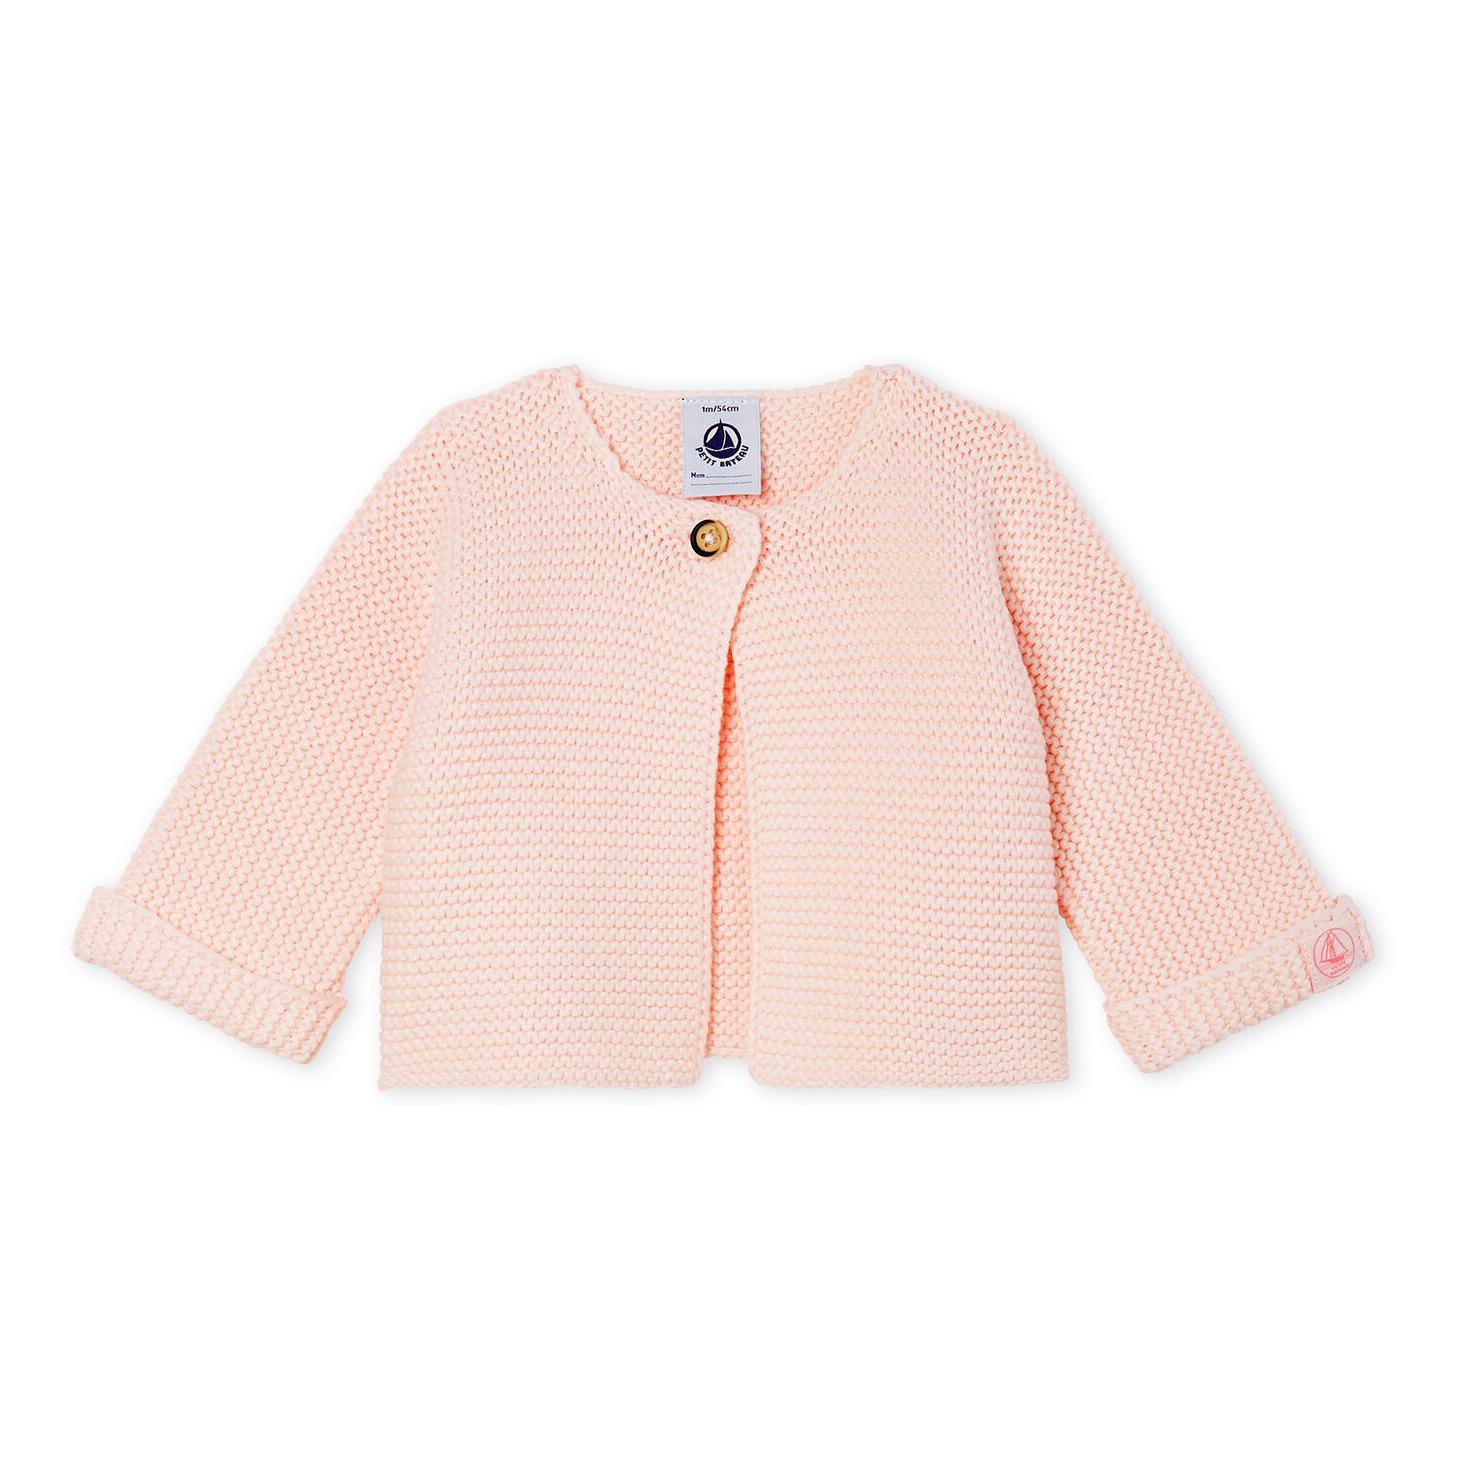 Petit Bateau - Cardigan Fabalero Tricot Coton Bio - Fille - Rose